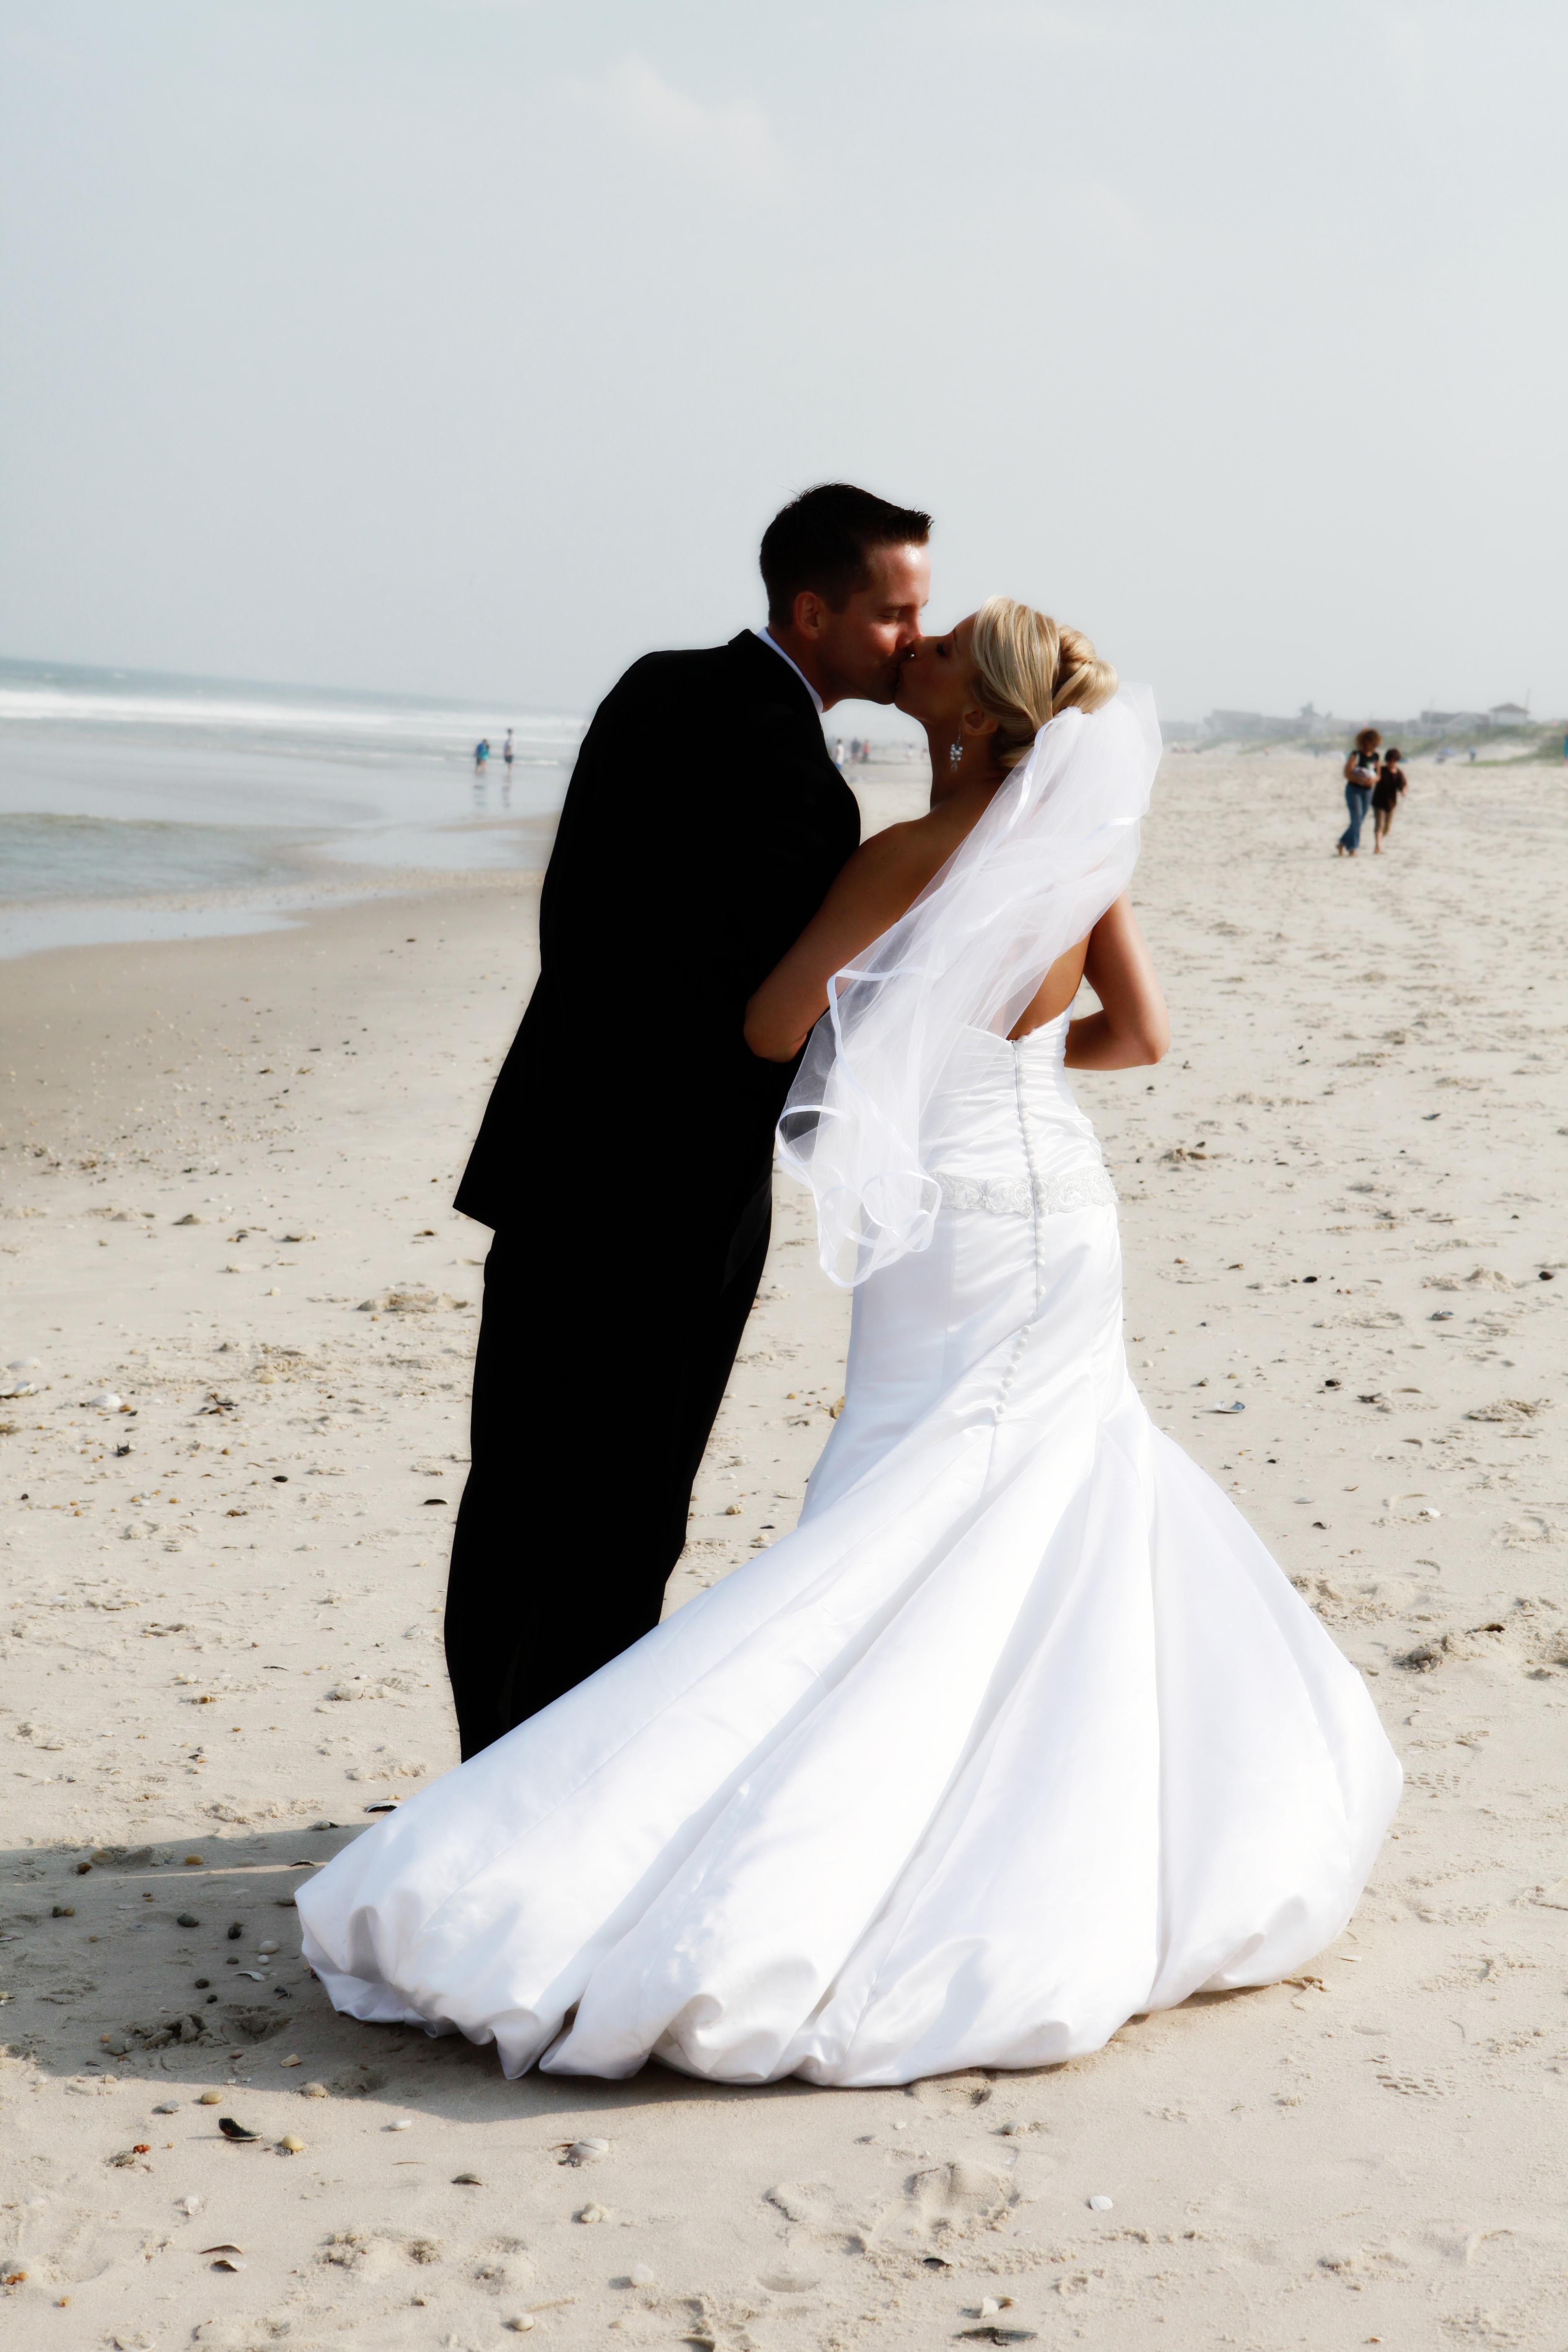 Wedding Dresses, Beach Wedding Dresses, Fashion, dress, Beach